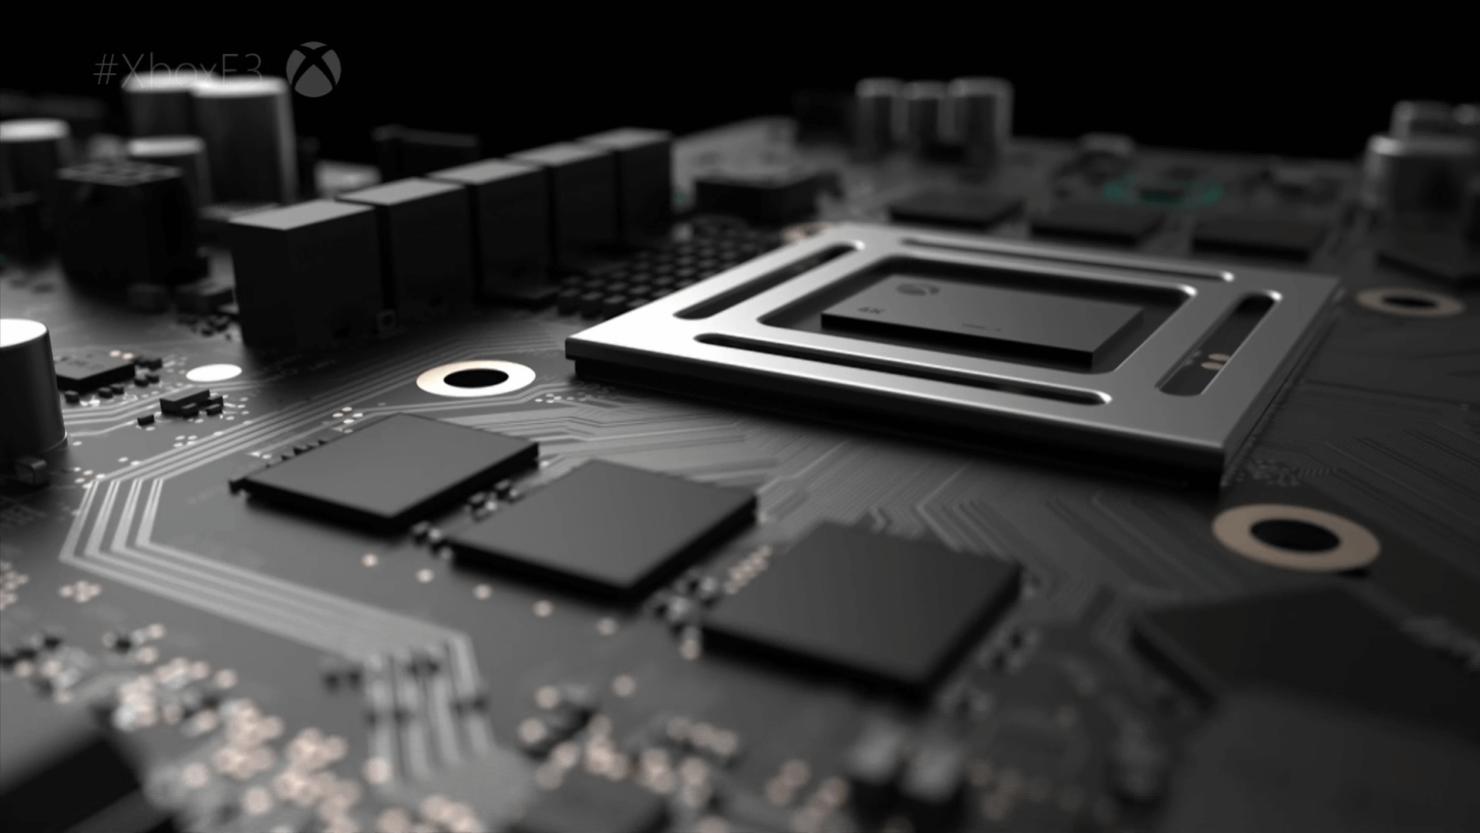 Project Scorpio CPU